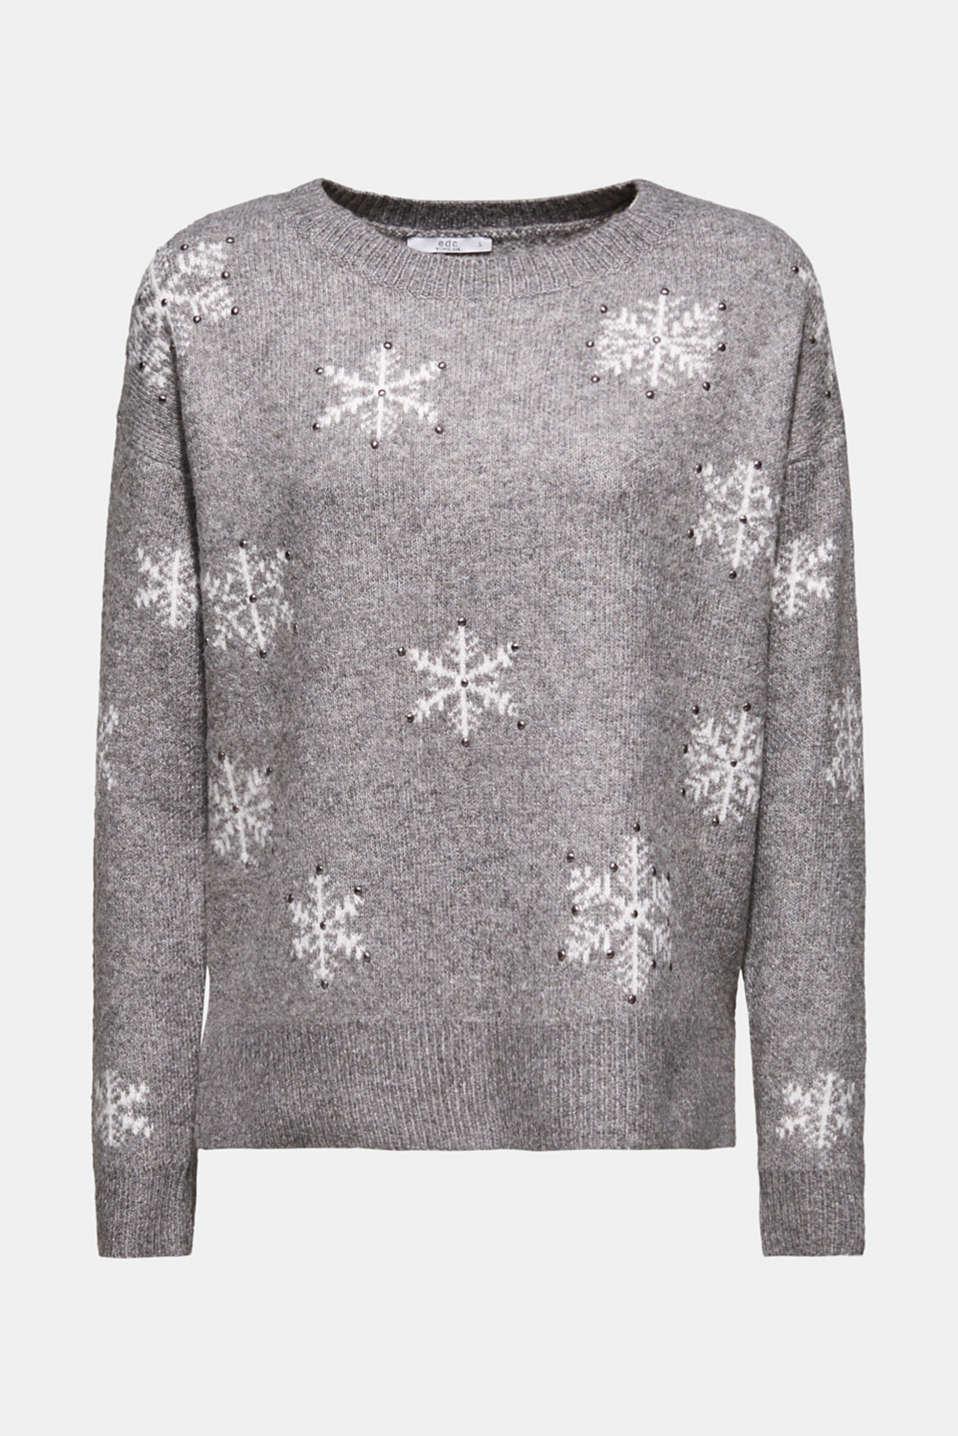 Sweaters, GUNMETAL 4, detail image number 8